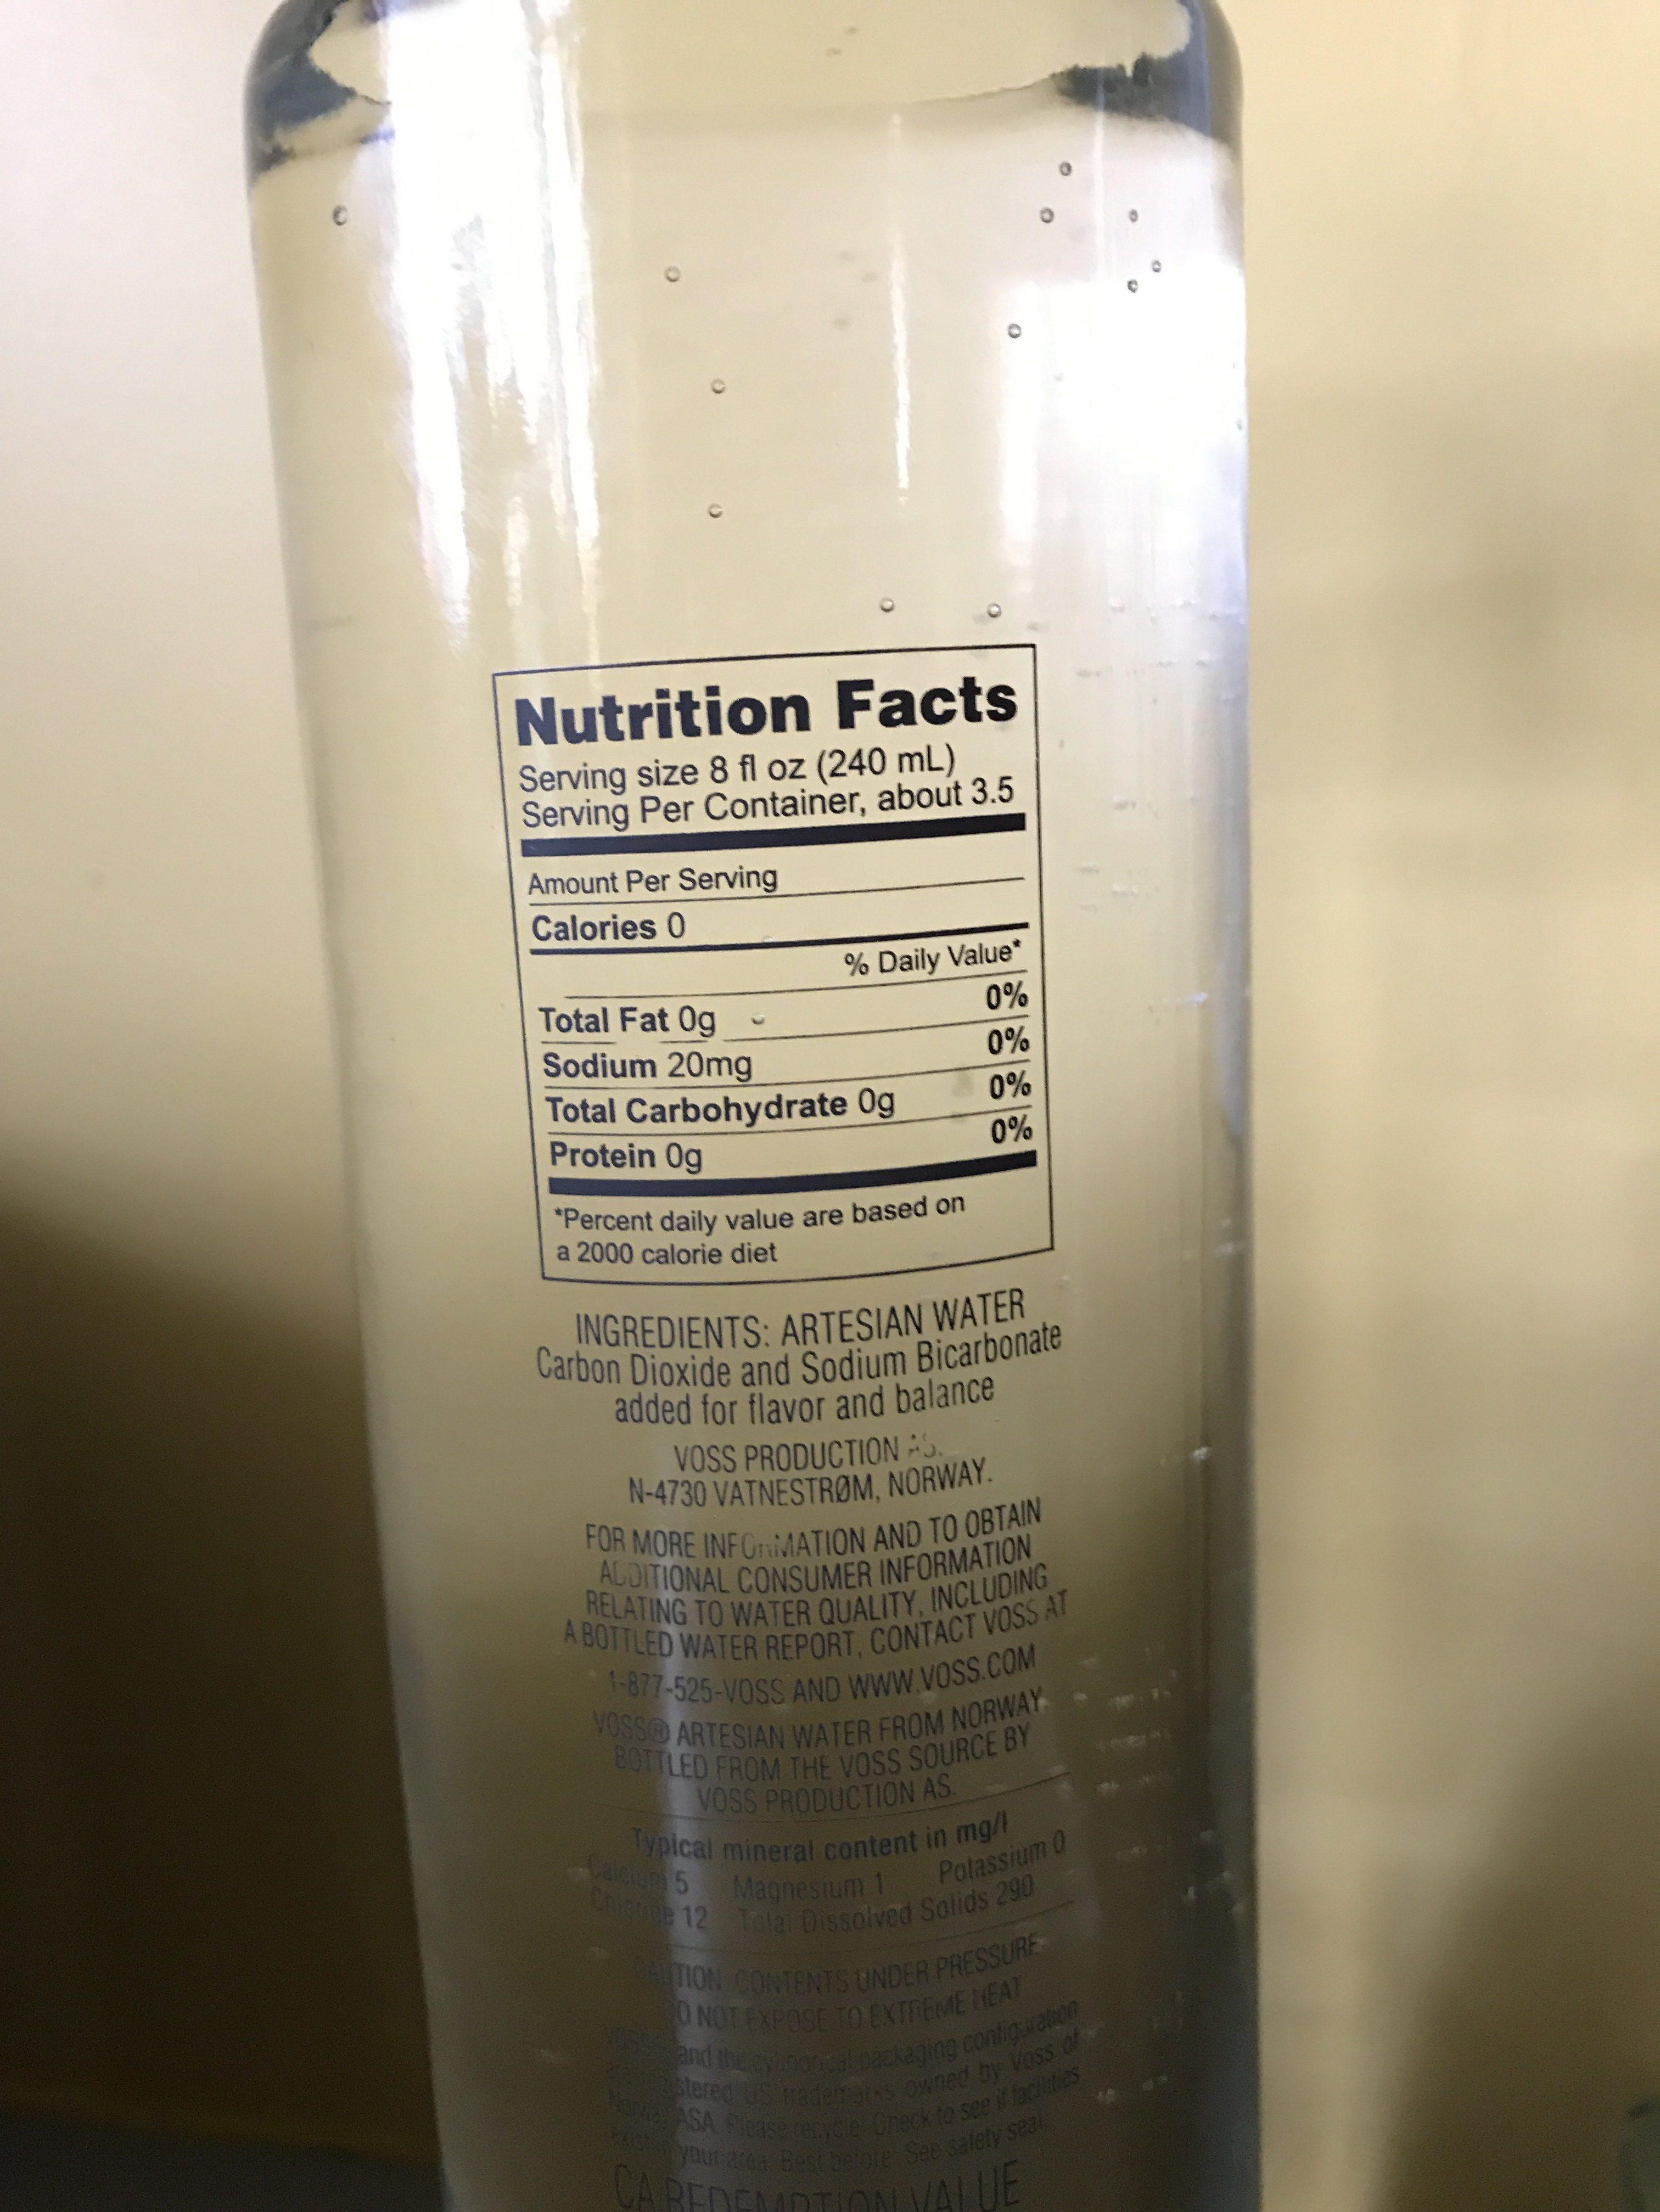 Sparkling Artesian Water From Norway - Ingredients